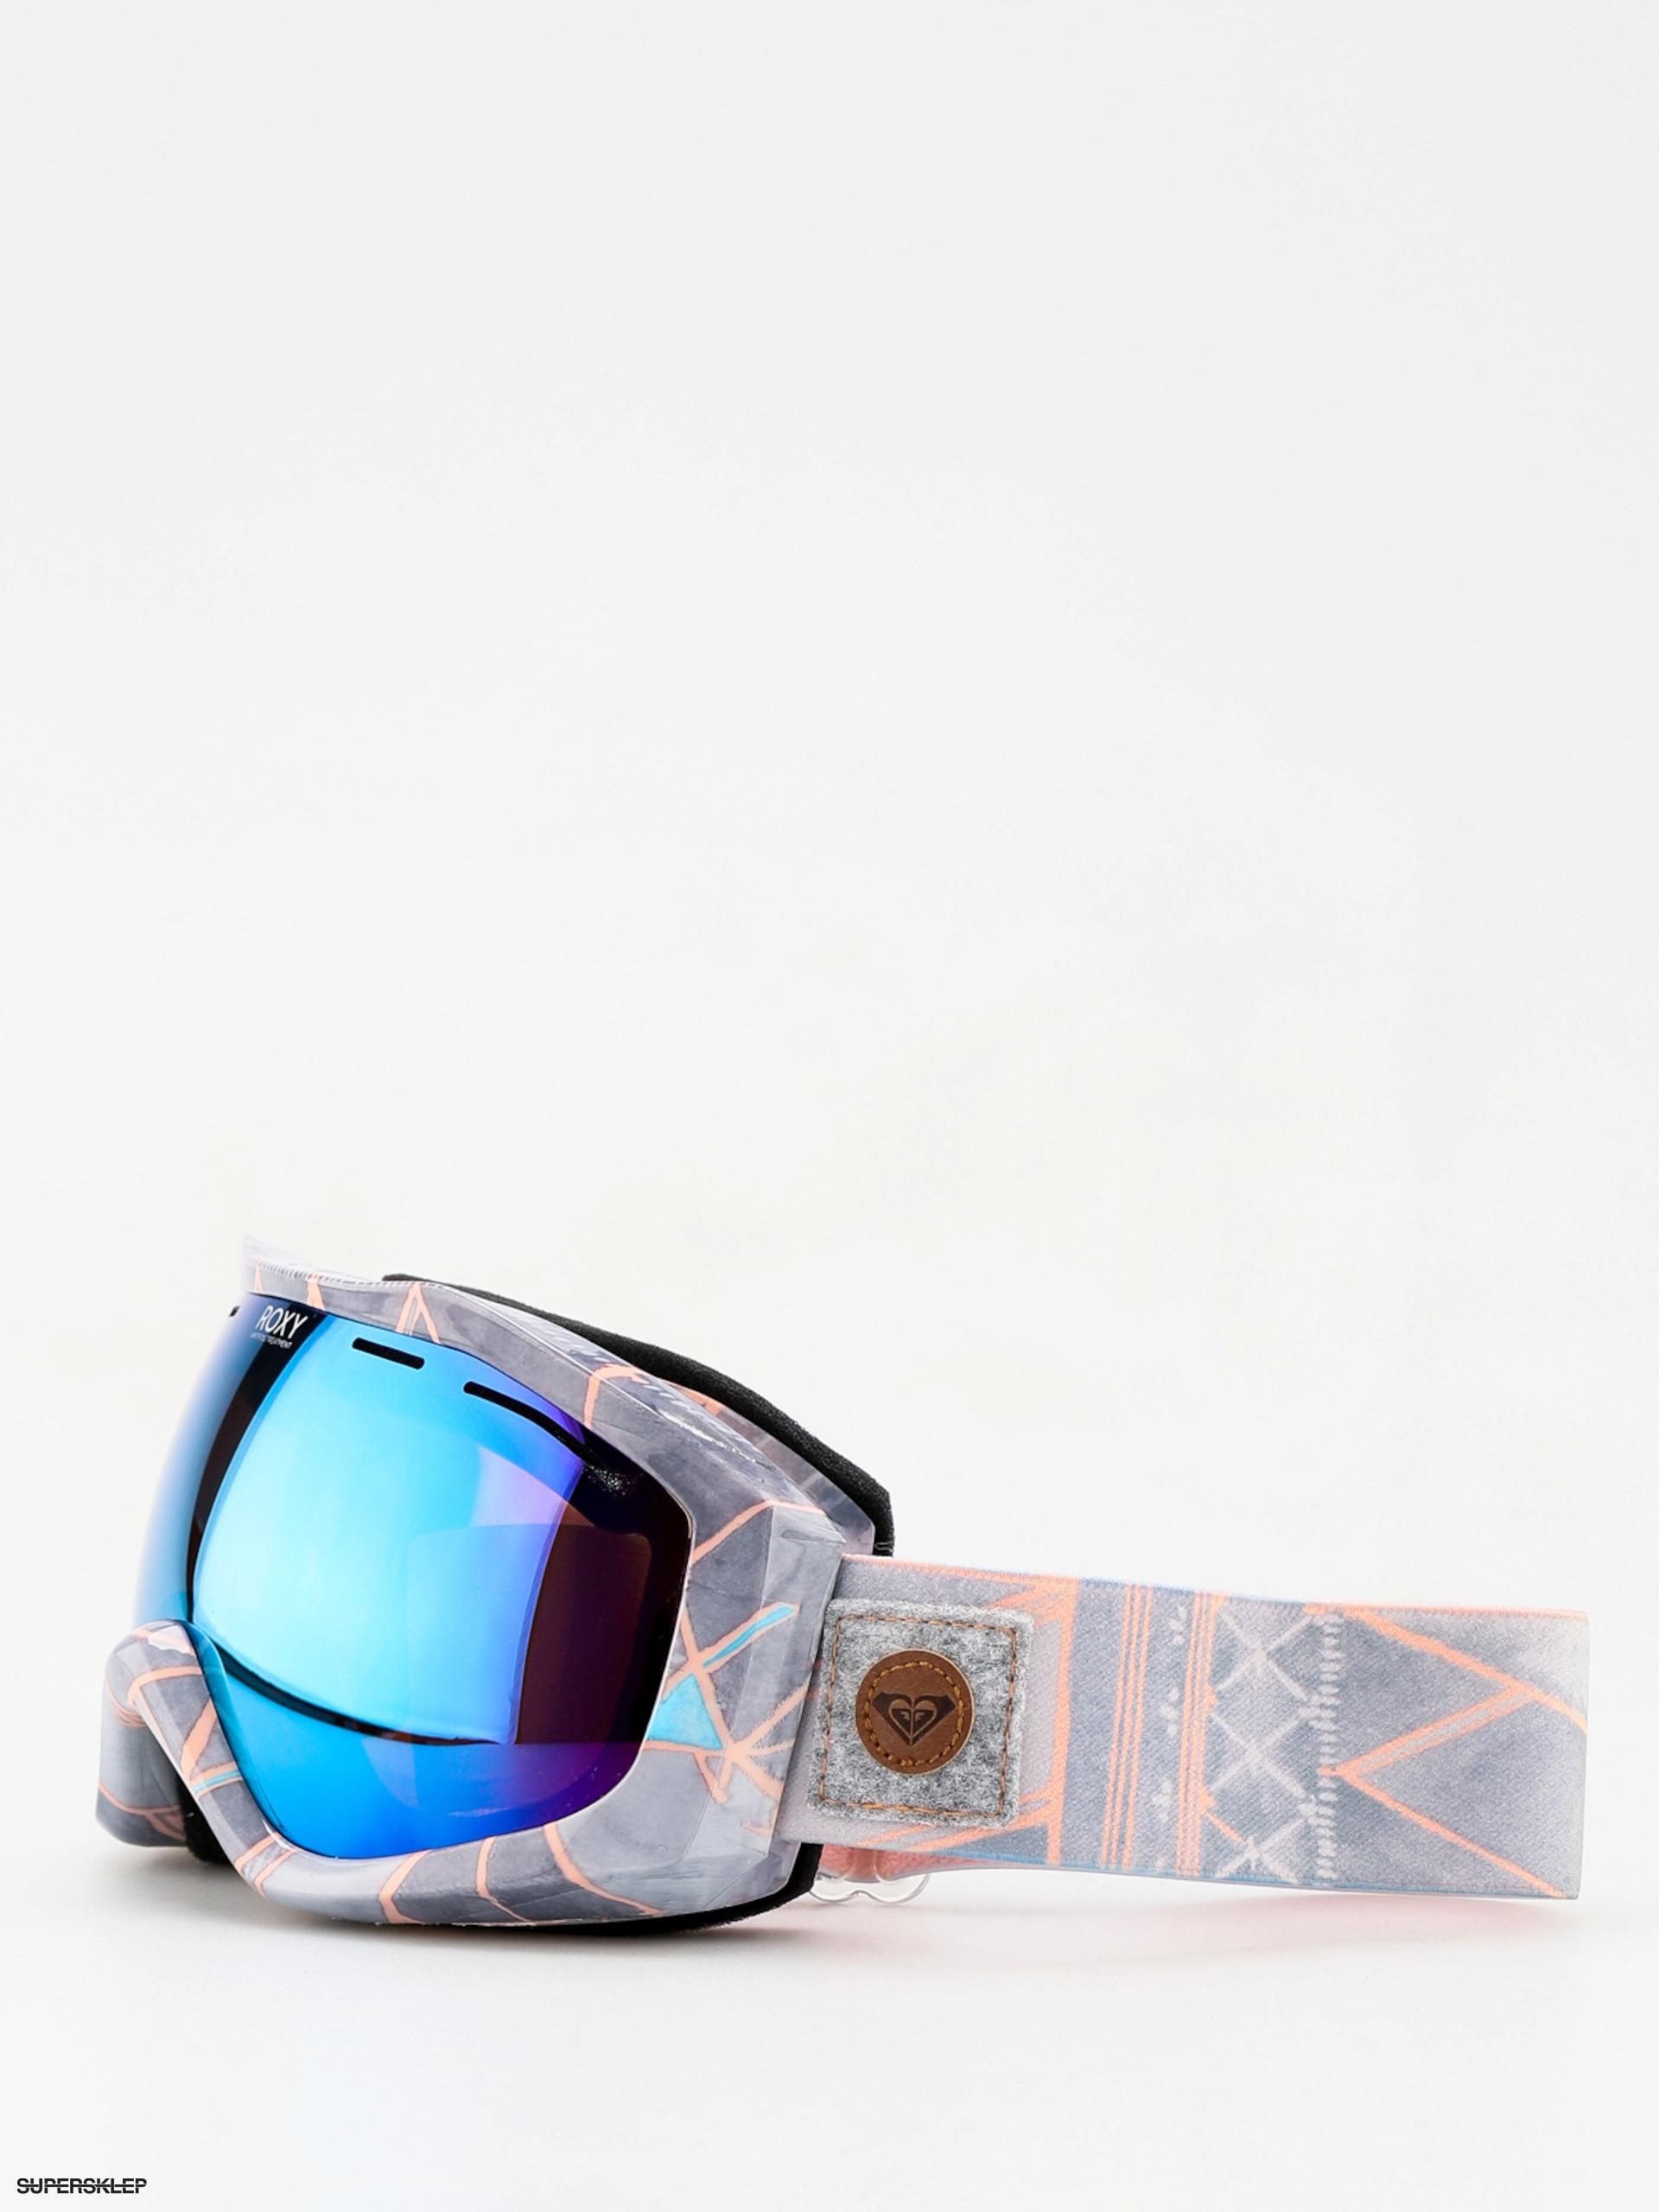 cd0588bb5 Okuliare na snowboard Roxy Sunset Art Wmn (mosaic)